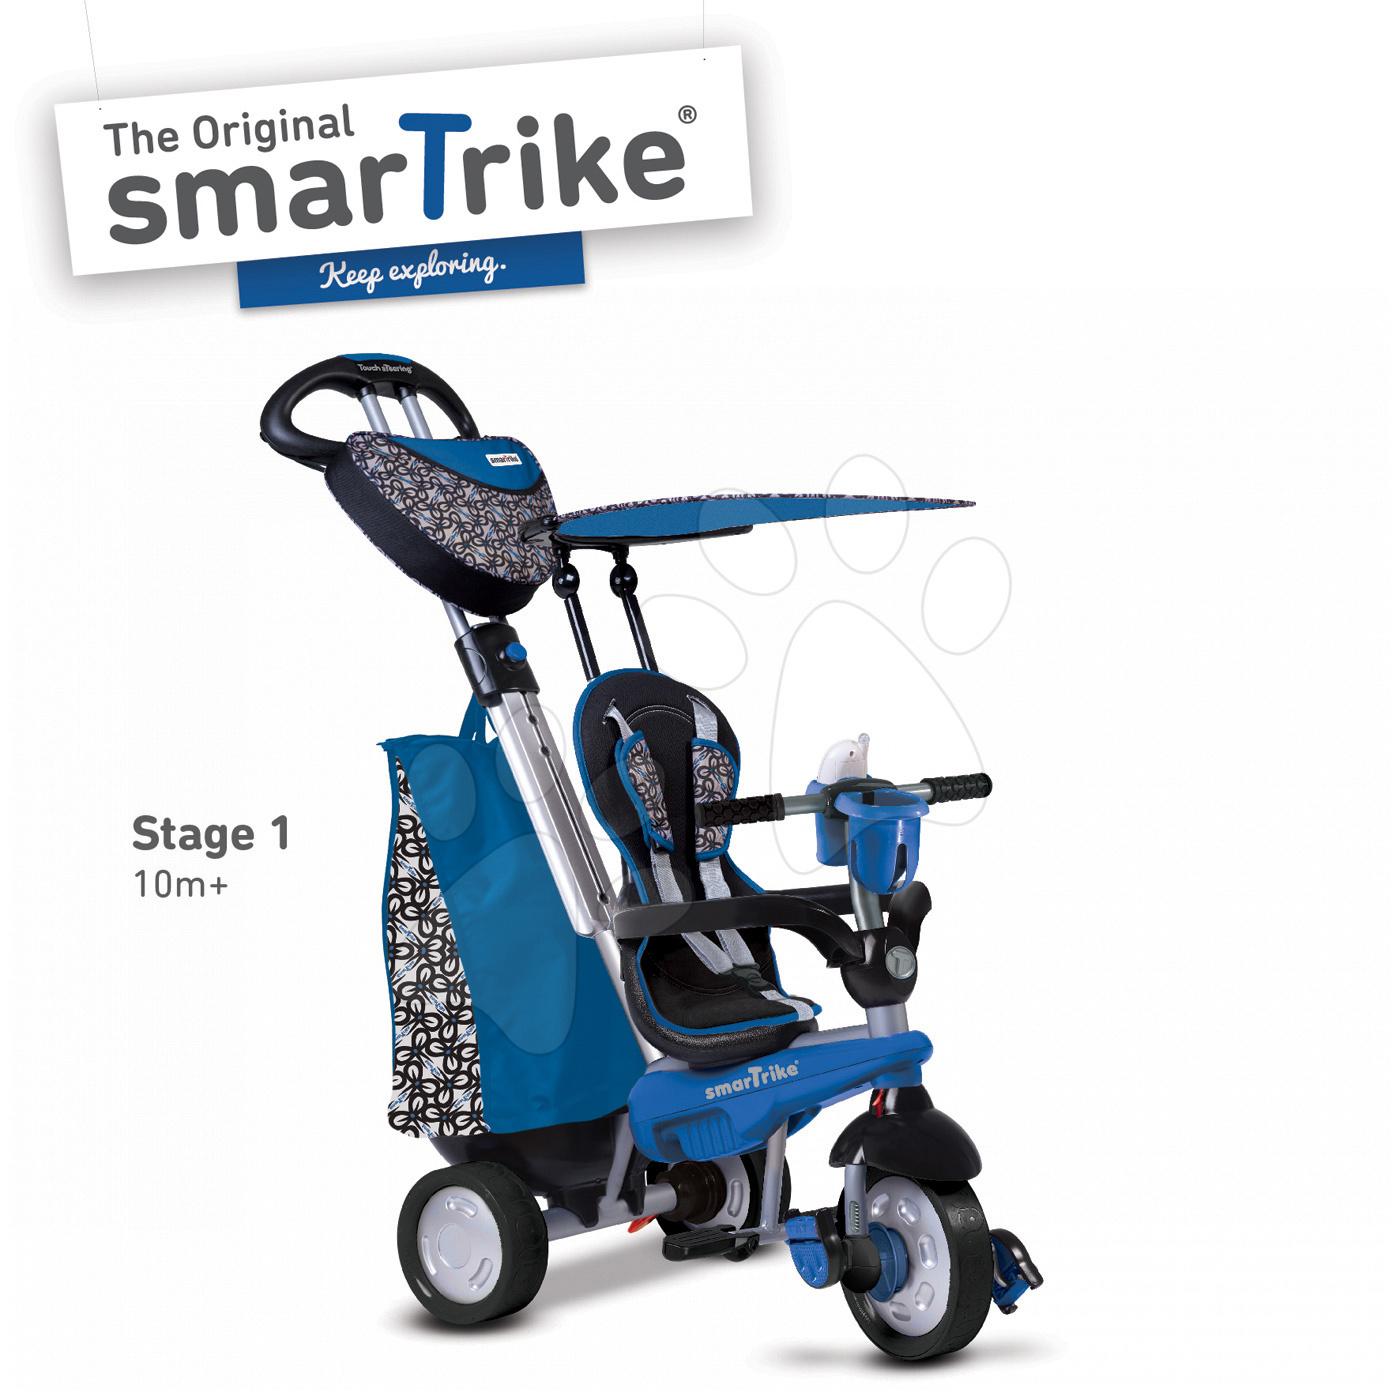 Trojkolky od 10 mesiacov - Trojkolka Dream Legend Touch Steering 4v1 smarTrike s 2 taškami modro-čierna od 10 mes